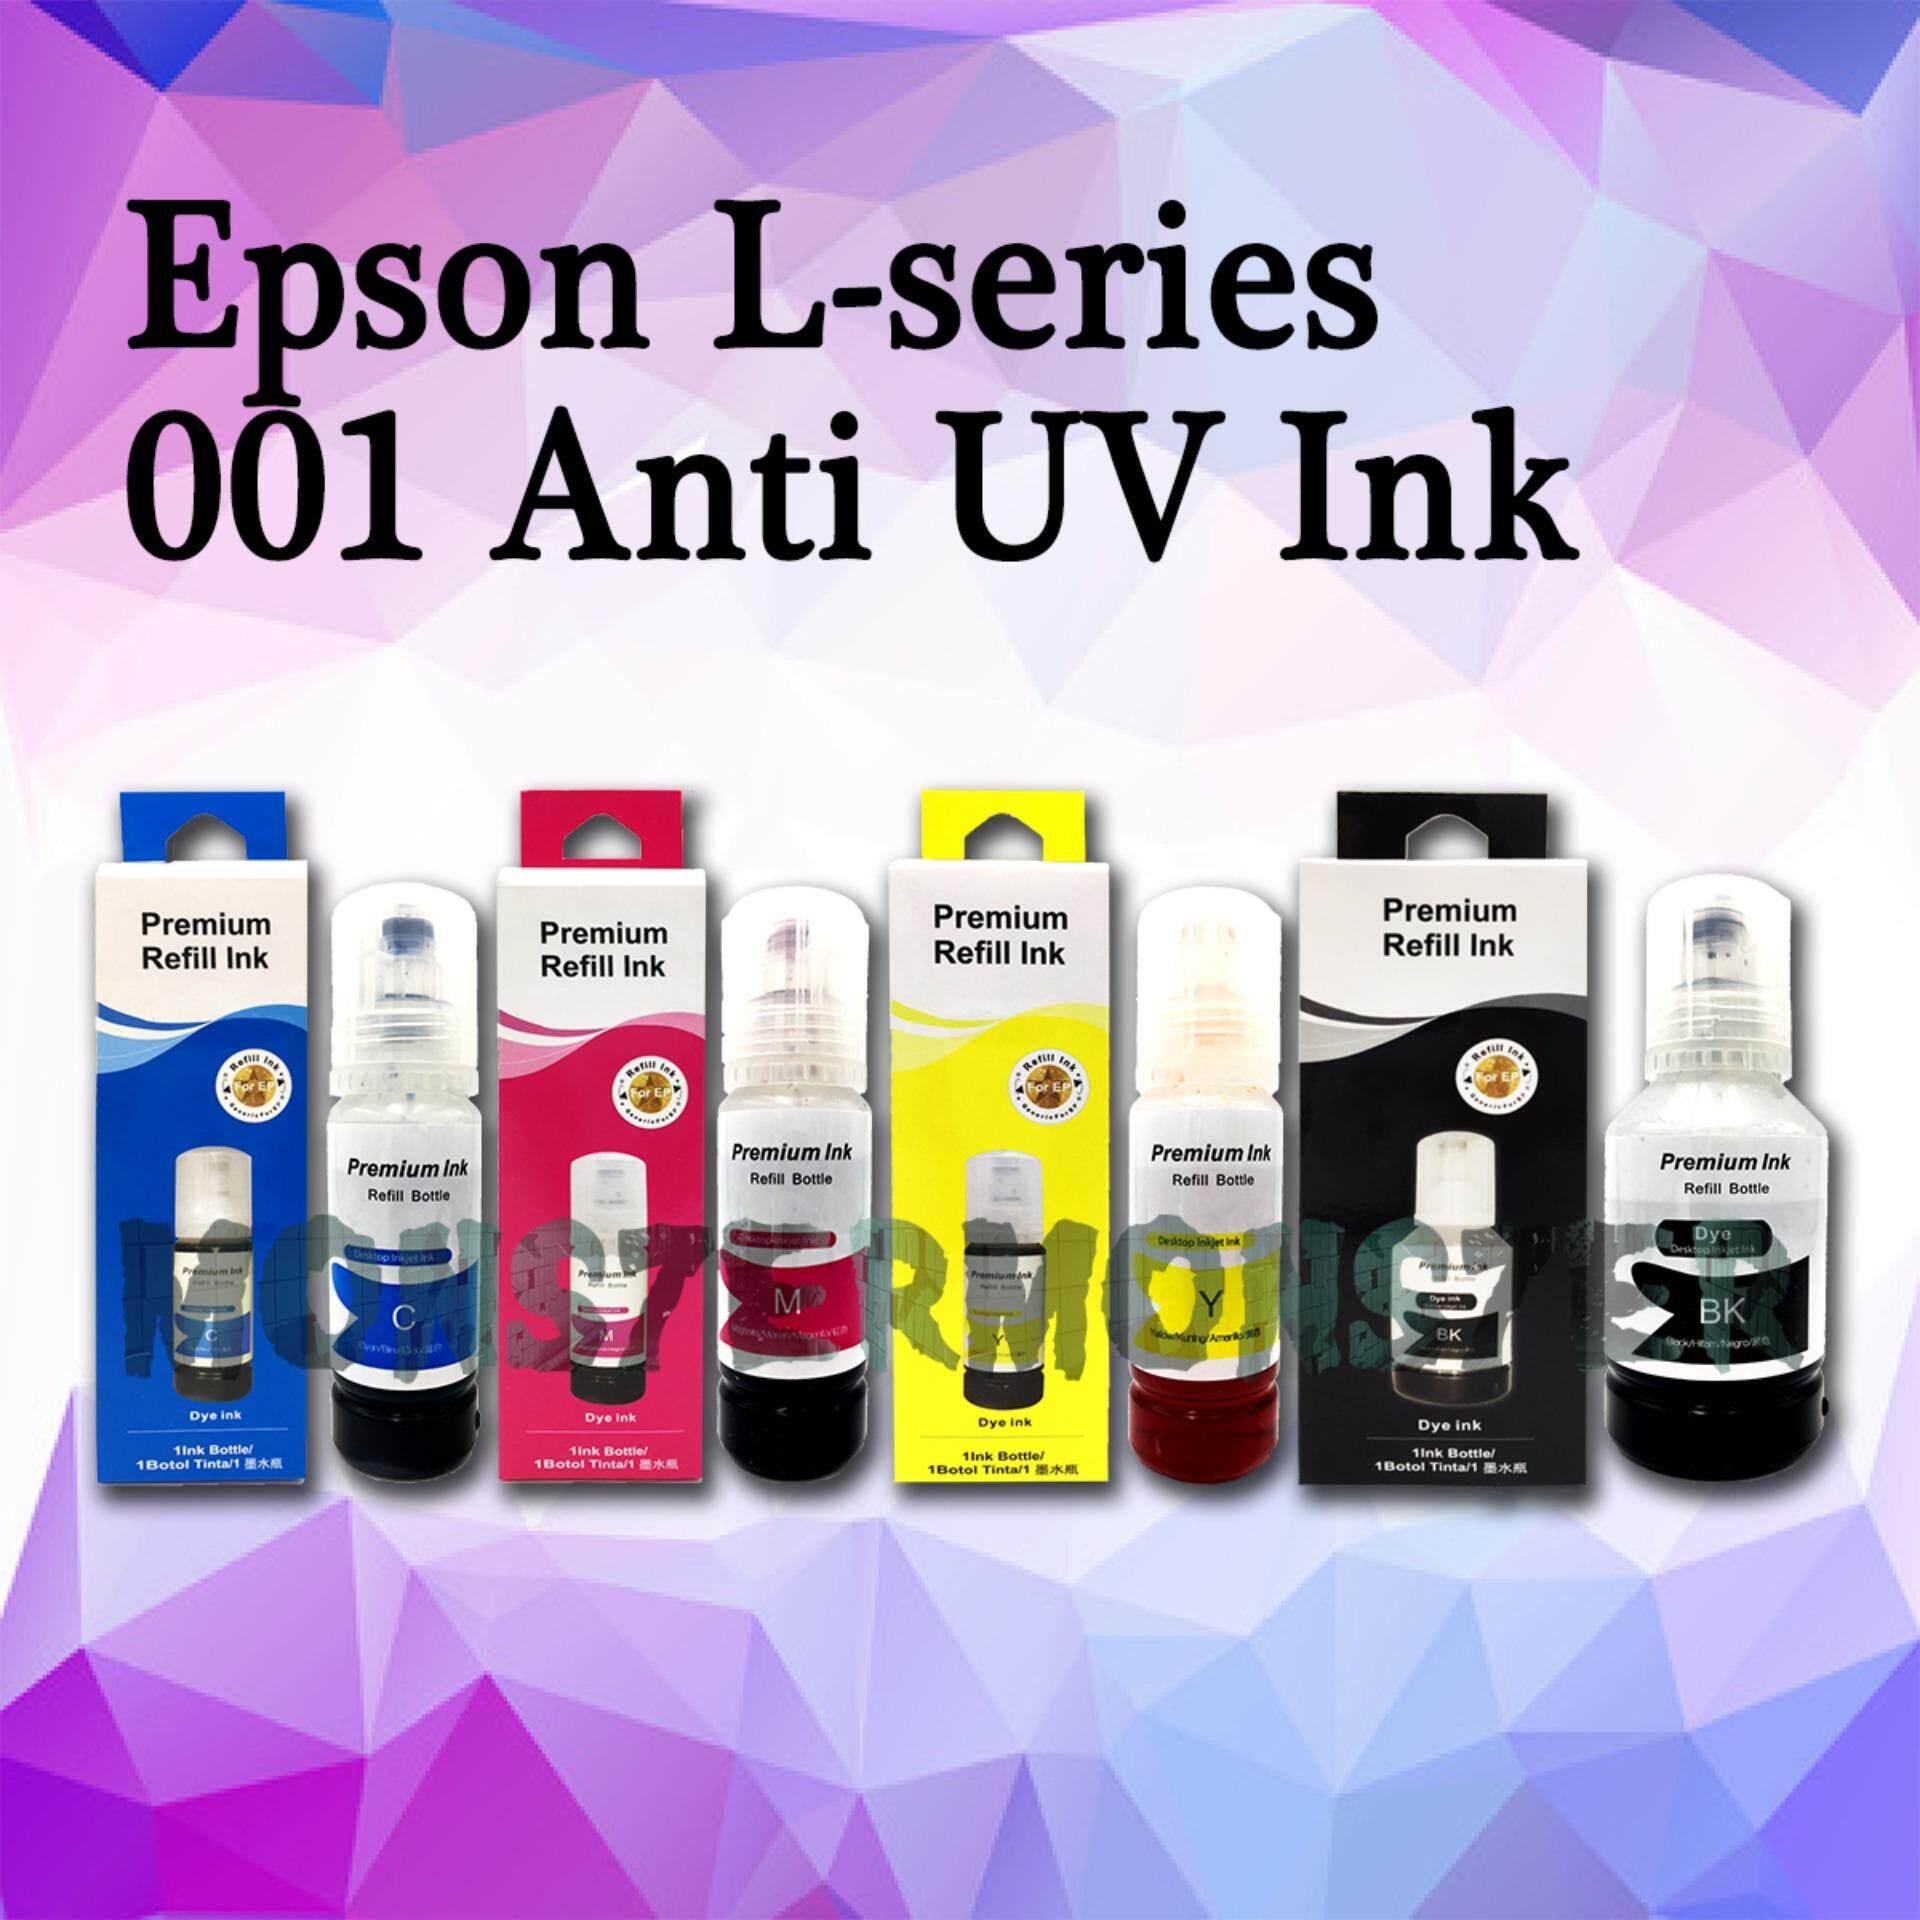 Sell Epson C13t141290 Cyan Cheapest Best Quality My Store Original Tinta Botol Set T6641 T6644 Myr 99